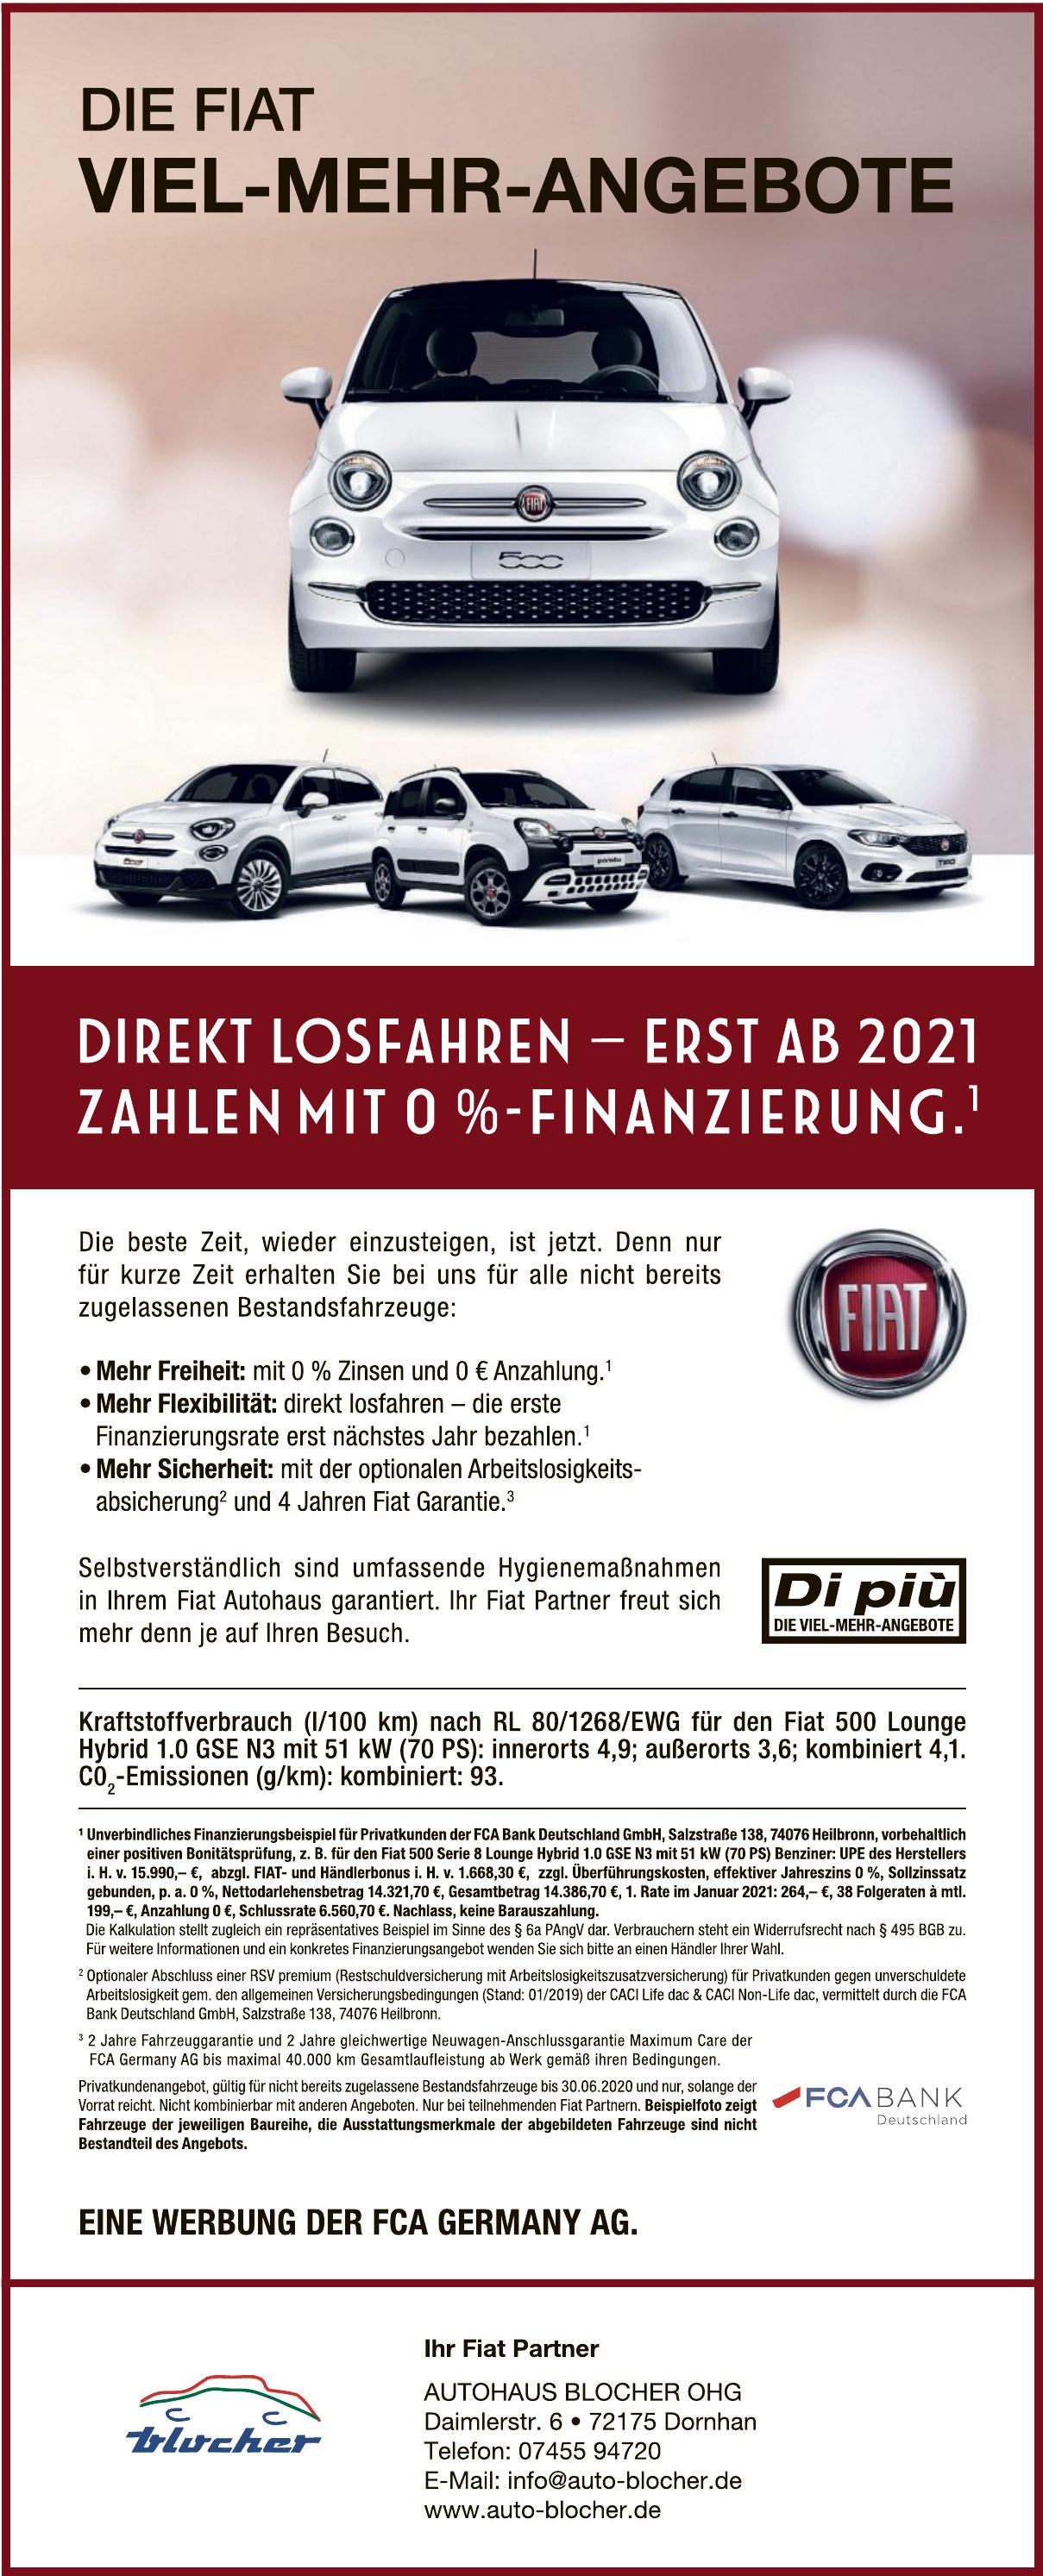 Autohaus Blocher OHG